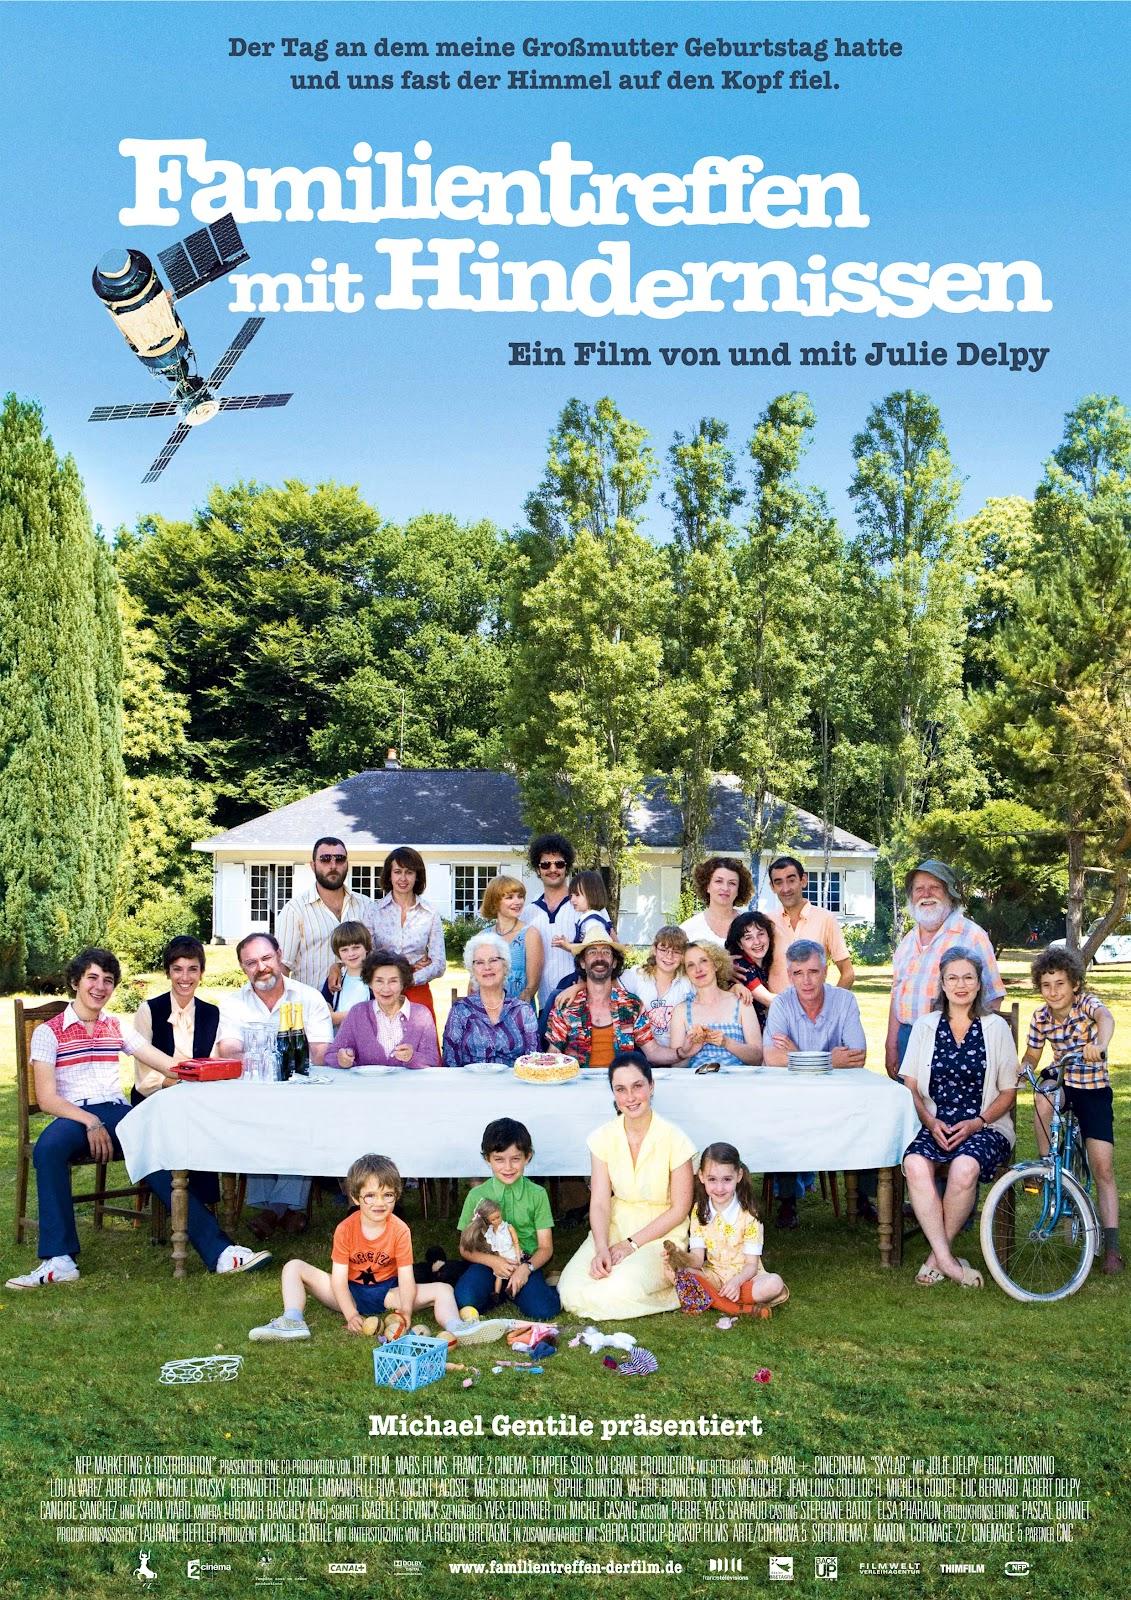 http://2.bp.blogspot.com/-jnQJLlwDzi8/UAWs8FtPpII/AAAAAAAAAE0/qaXmQtCuQew/s1600/Familientreffen_mit_Hindernissen_Filmplakat.jpg